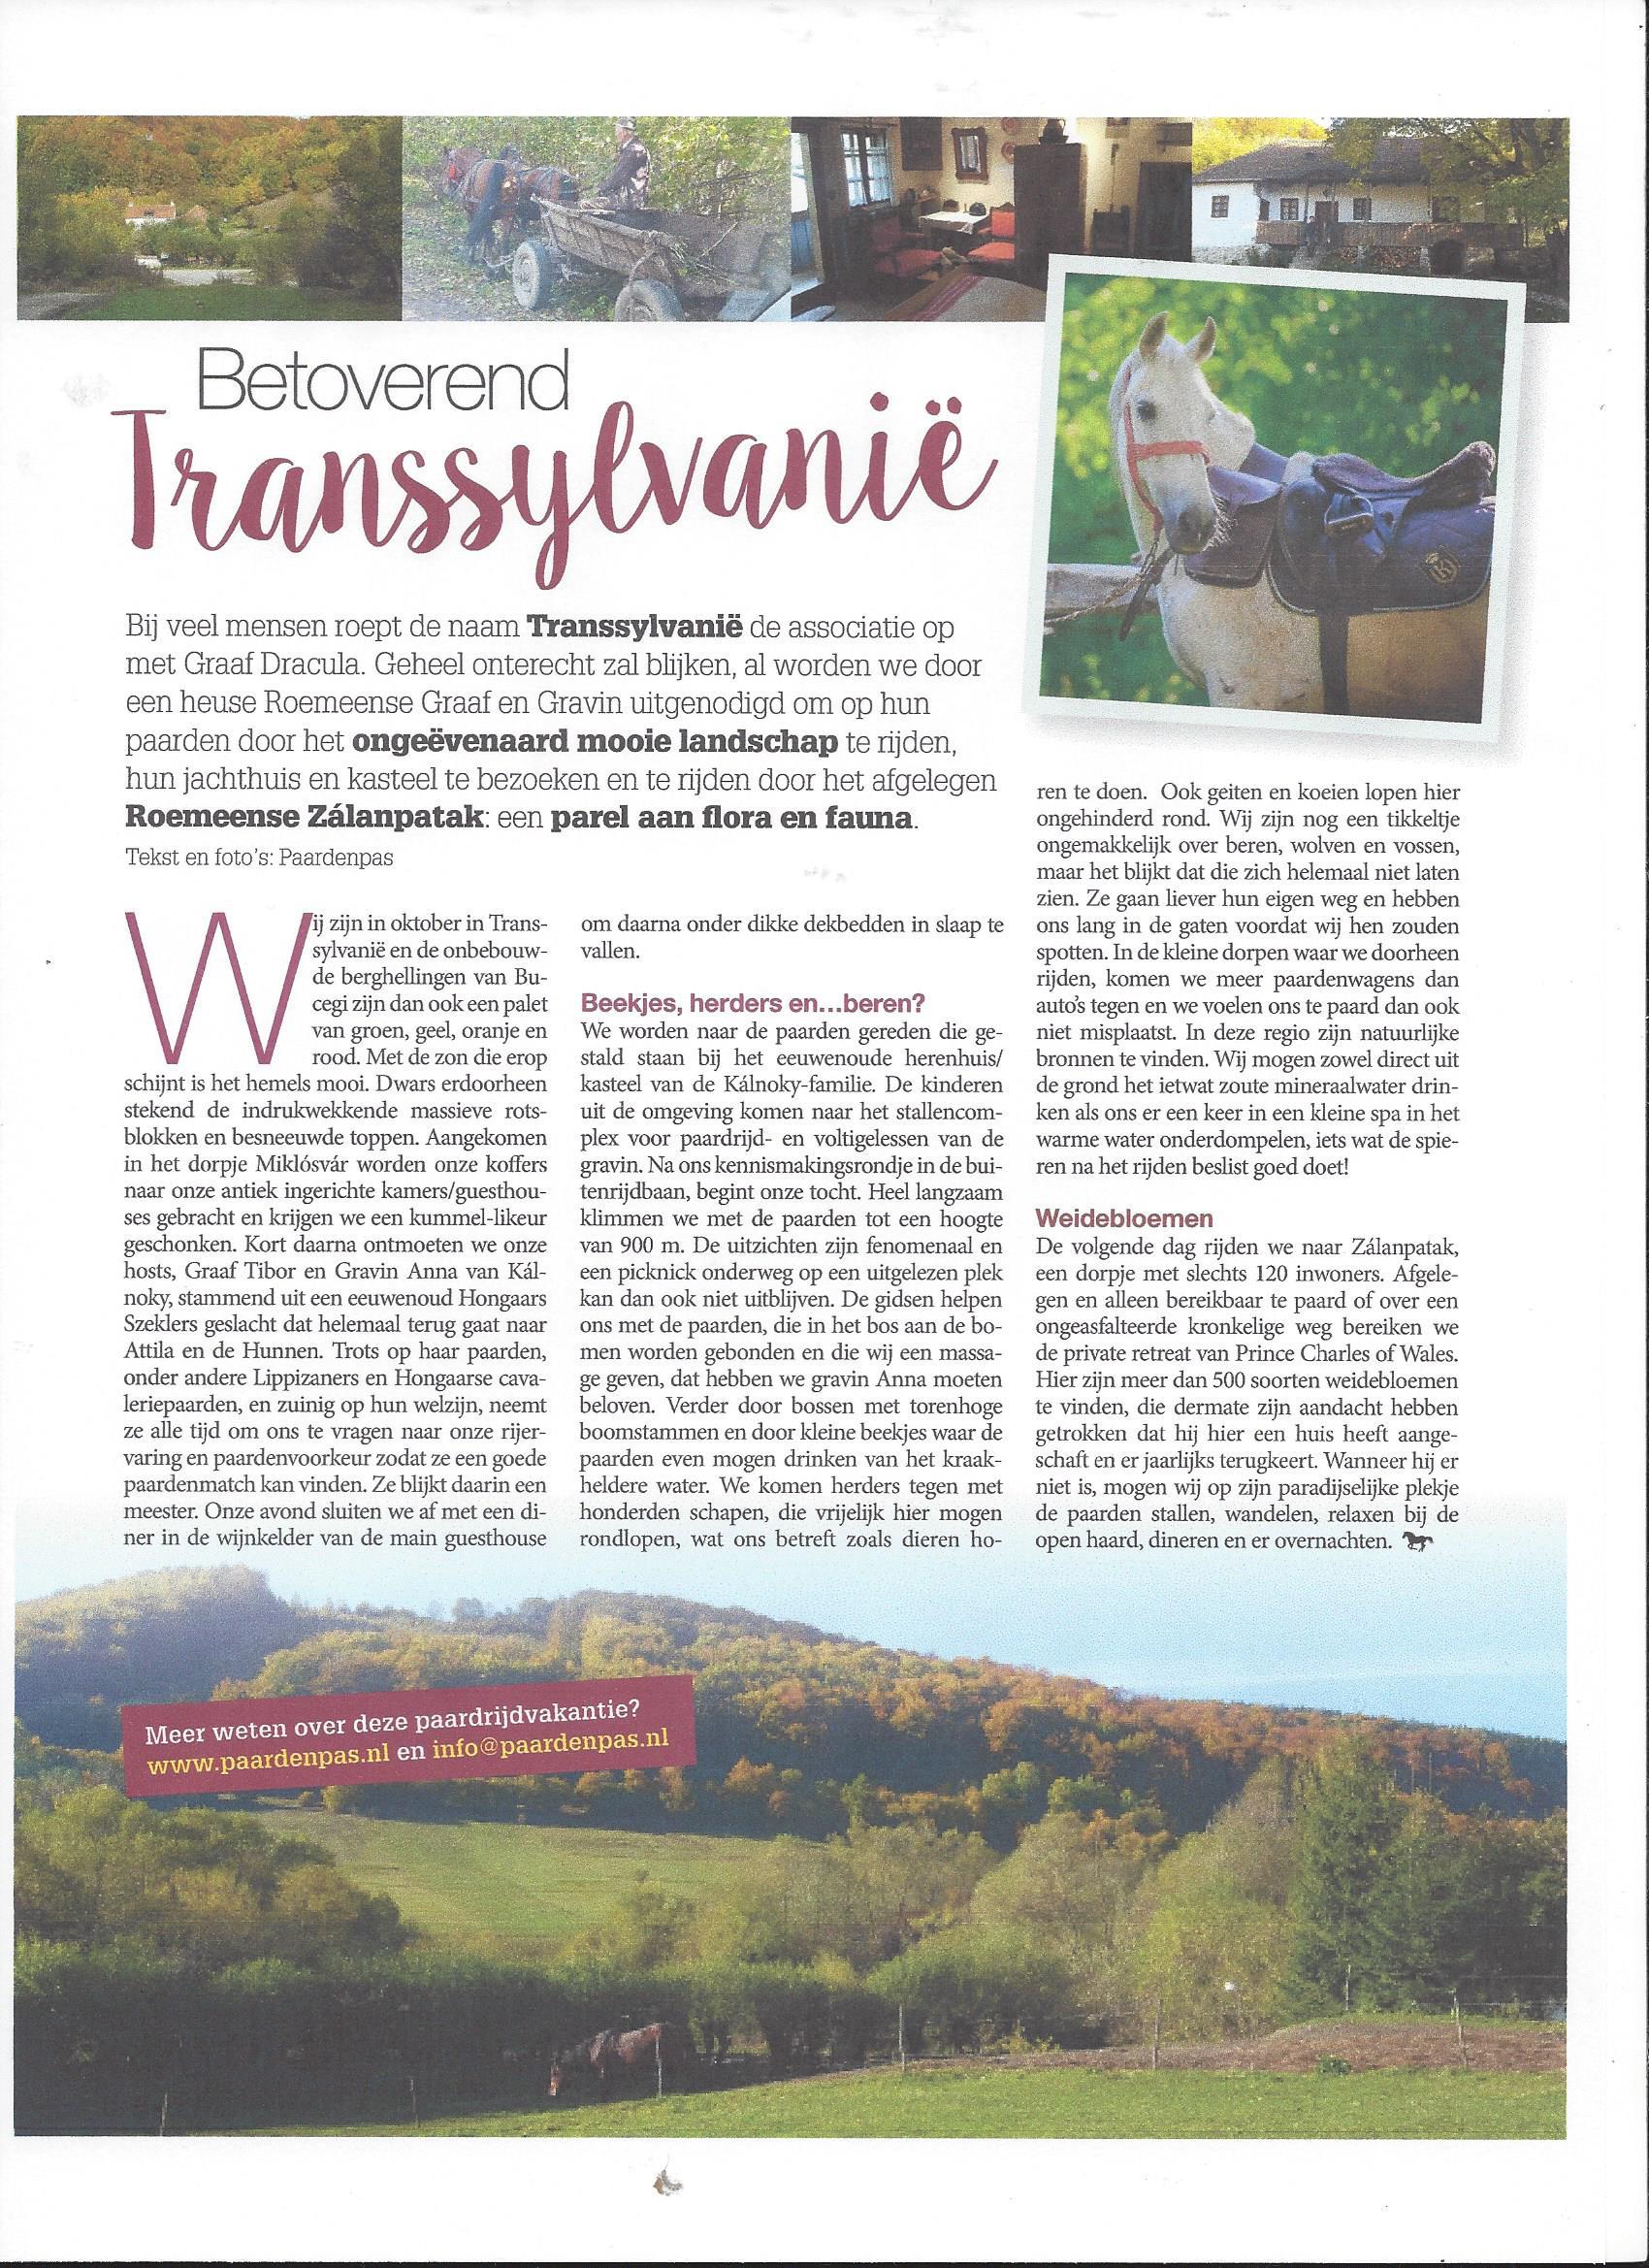 ROS Magazine - Betoverend Transsylvanië JPG